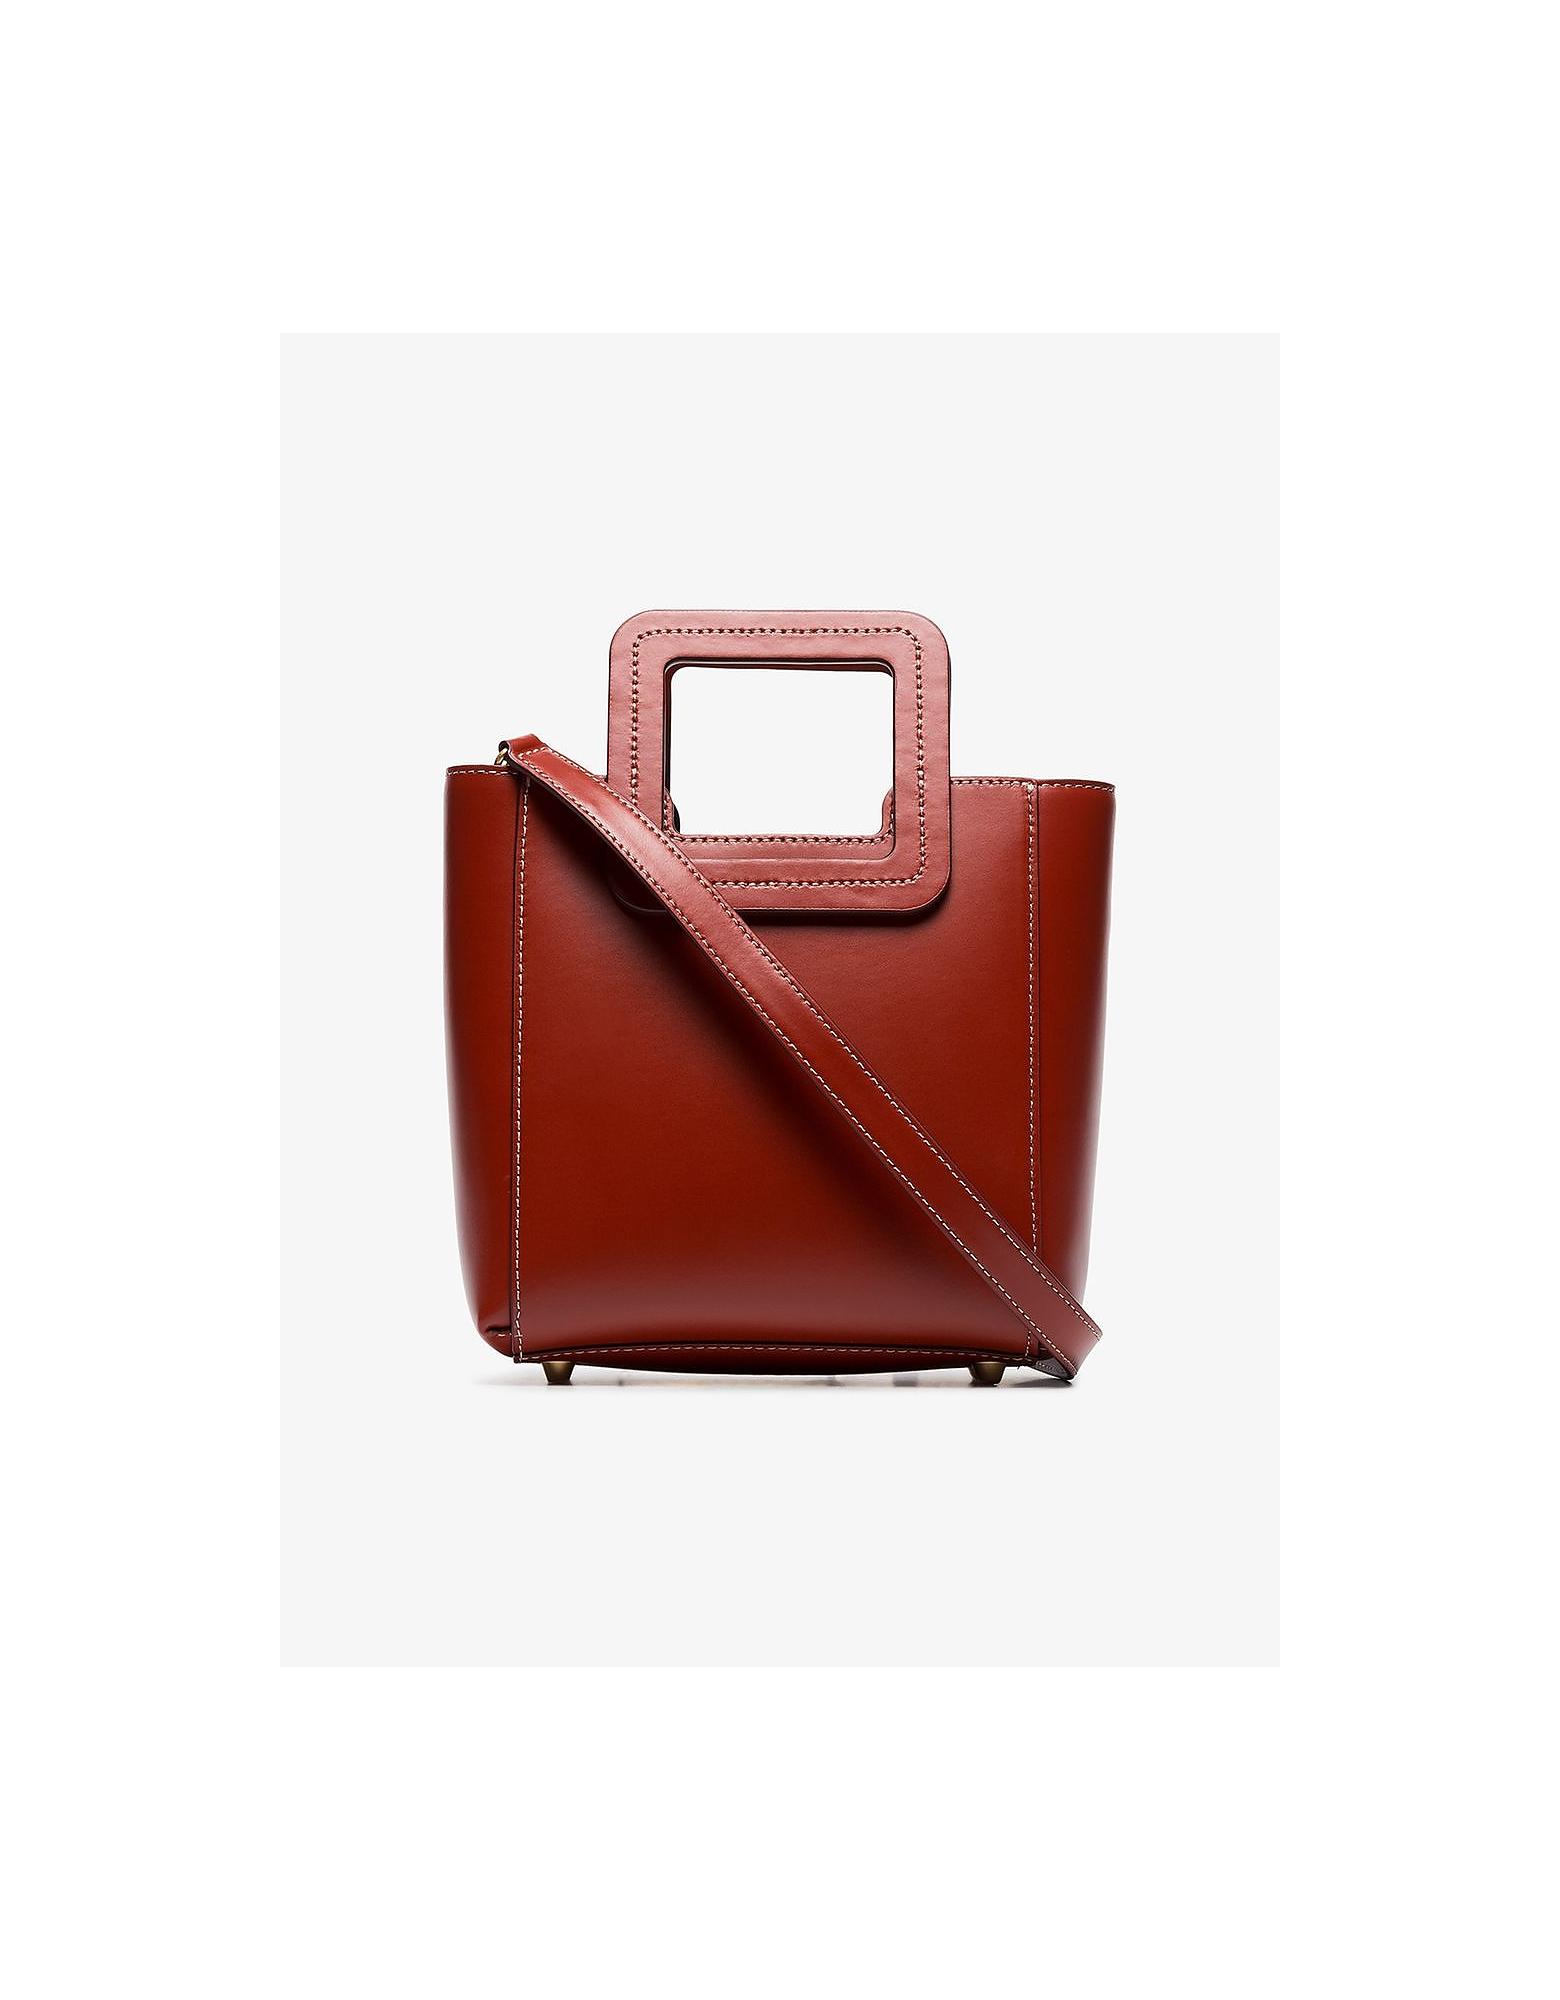 Staud Designer Handbags, Mini Shirley Leather Bag